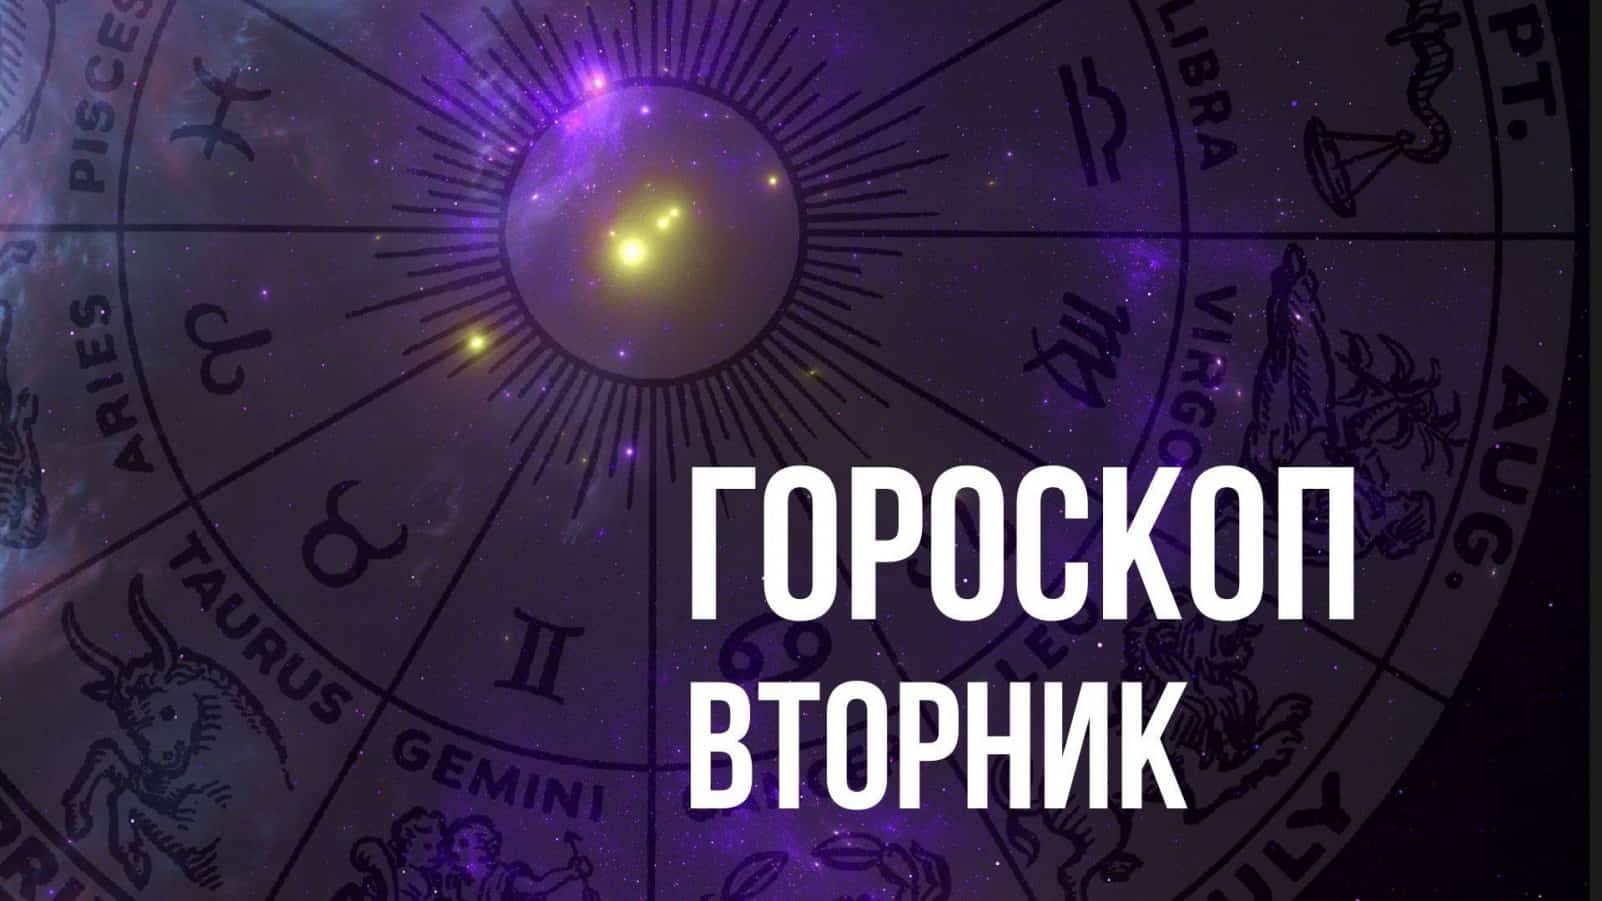 Гороскоп на вторник 10 августа для каждого знака Зодиака